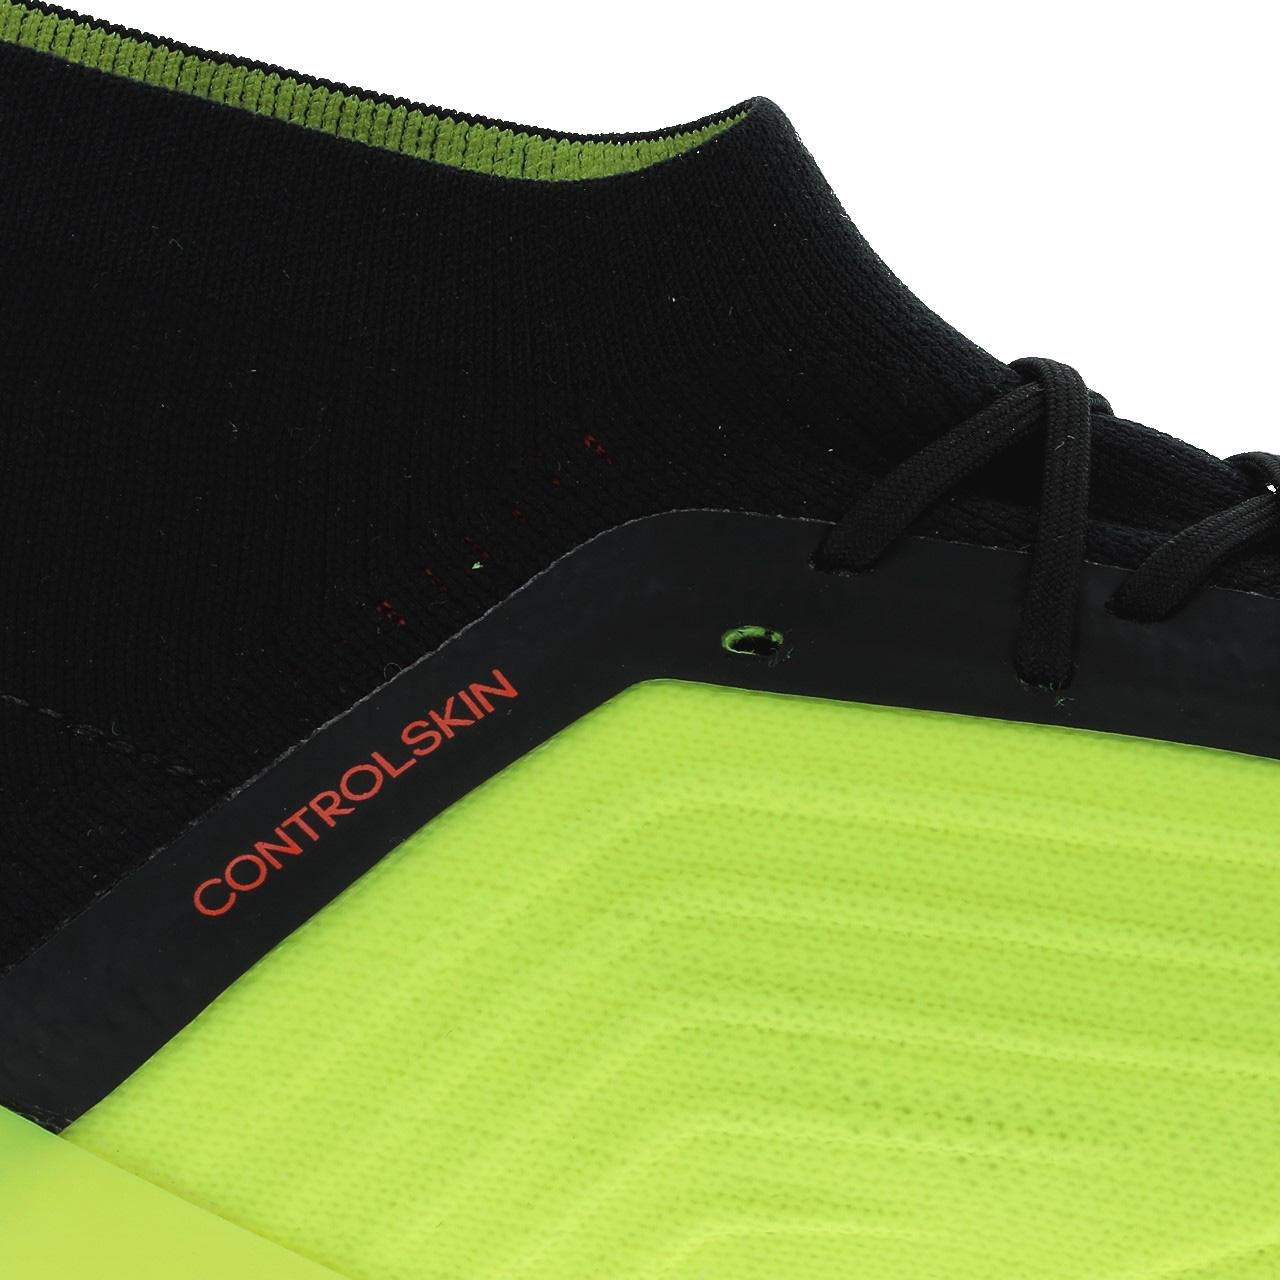 Football-Shoes-Flap-Adidas-Predator-18-1-Fg-Syello-Yellow-47849-New thumbnail 4